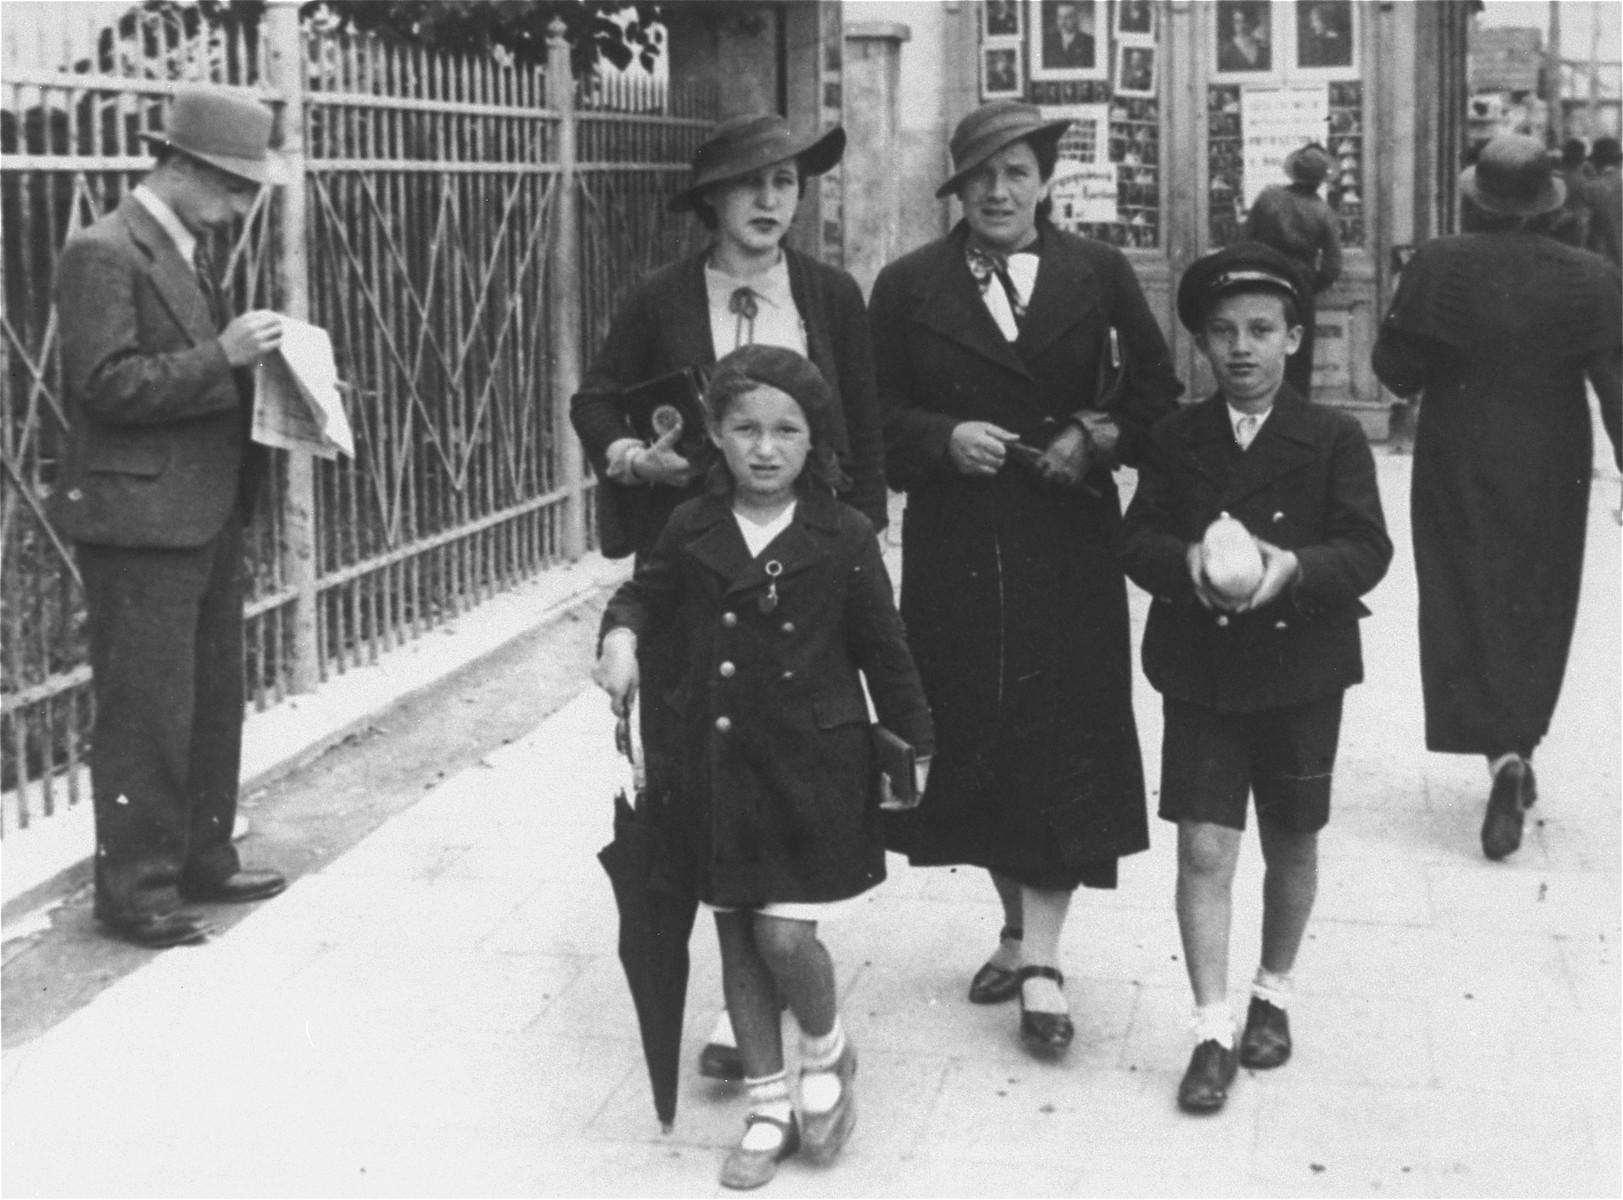 Sabina, her brother Jurek and  mother Sala Haberman (nee Kulewicz) walk down the main street of Borislav on Ulica Panska.   Her mother's friend Herzfeld (on the left) accompanies them.